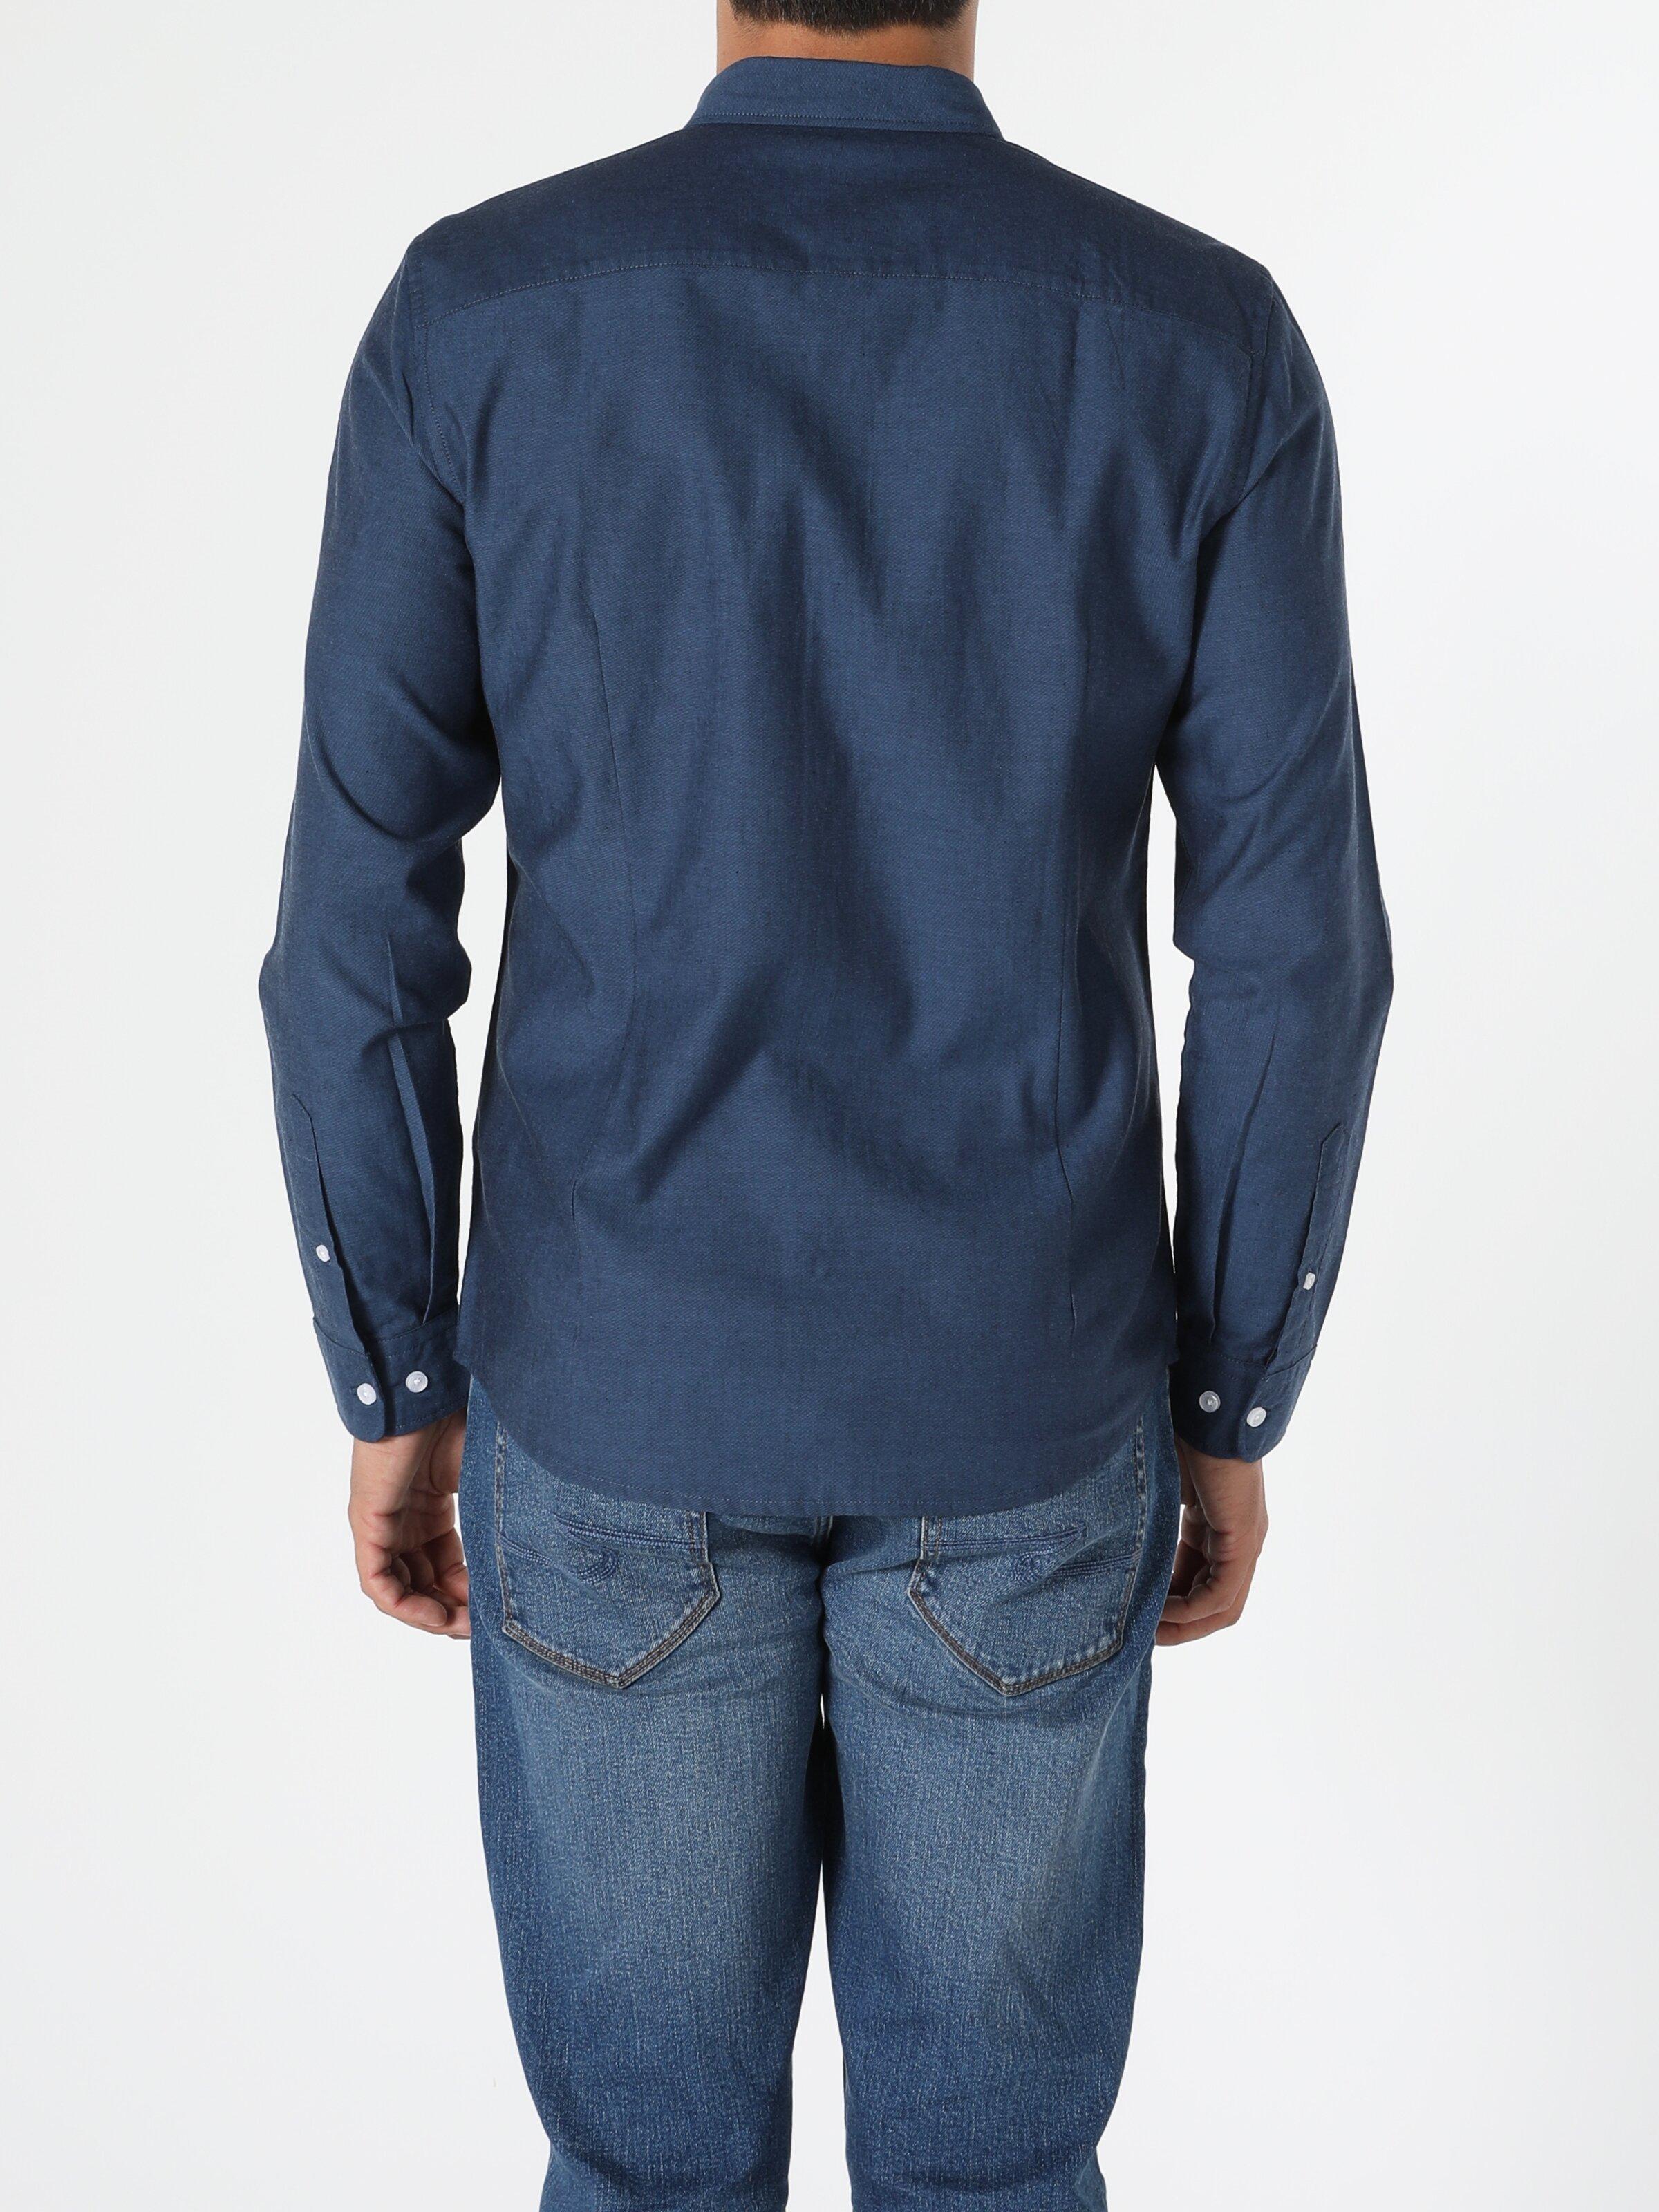 Slim Fit Shirt Neck Erkek Lacivert Uzun Kol Gömlek